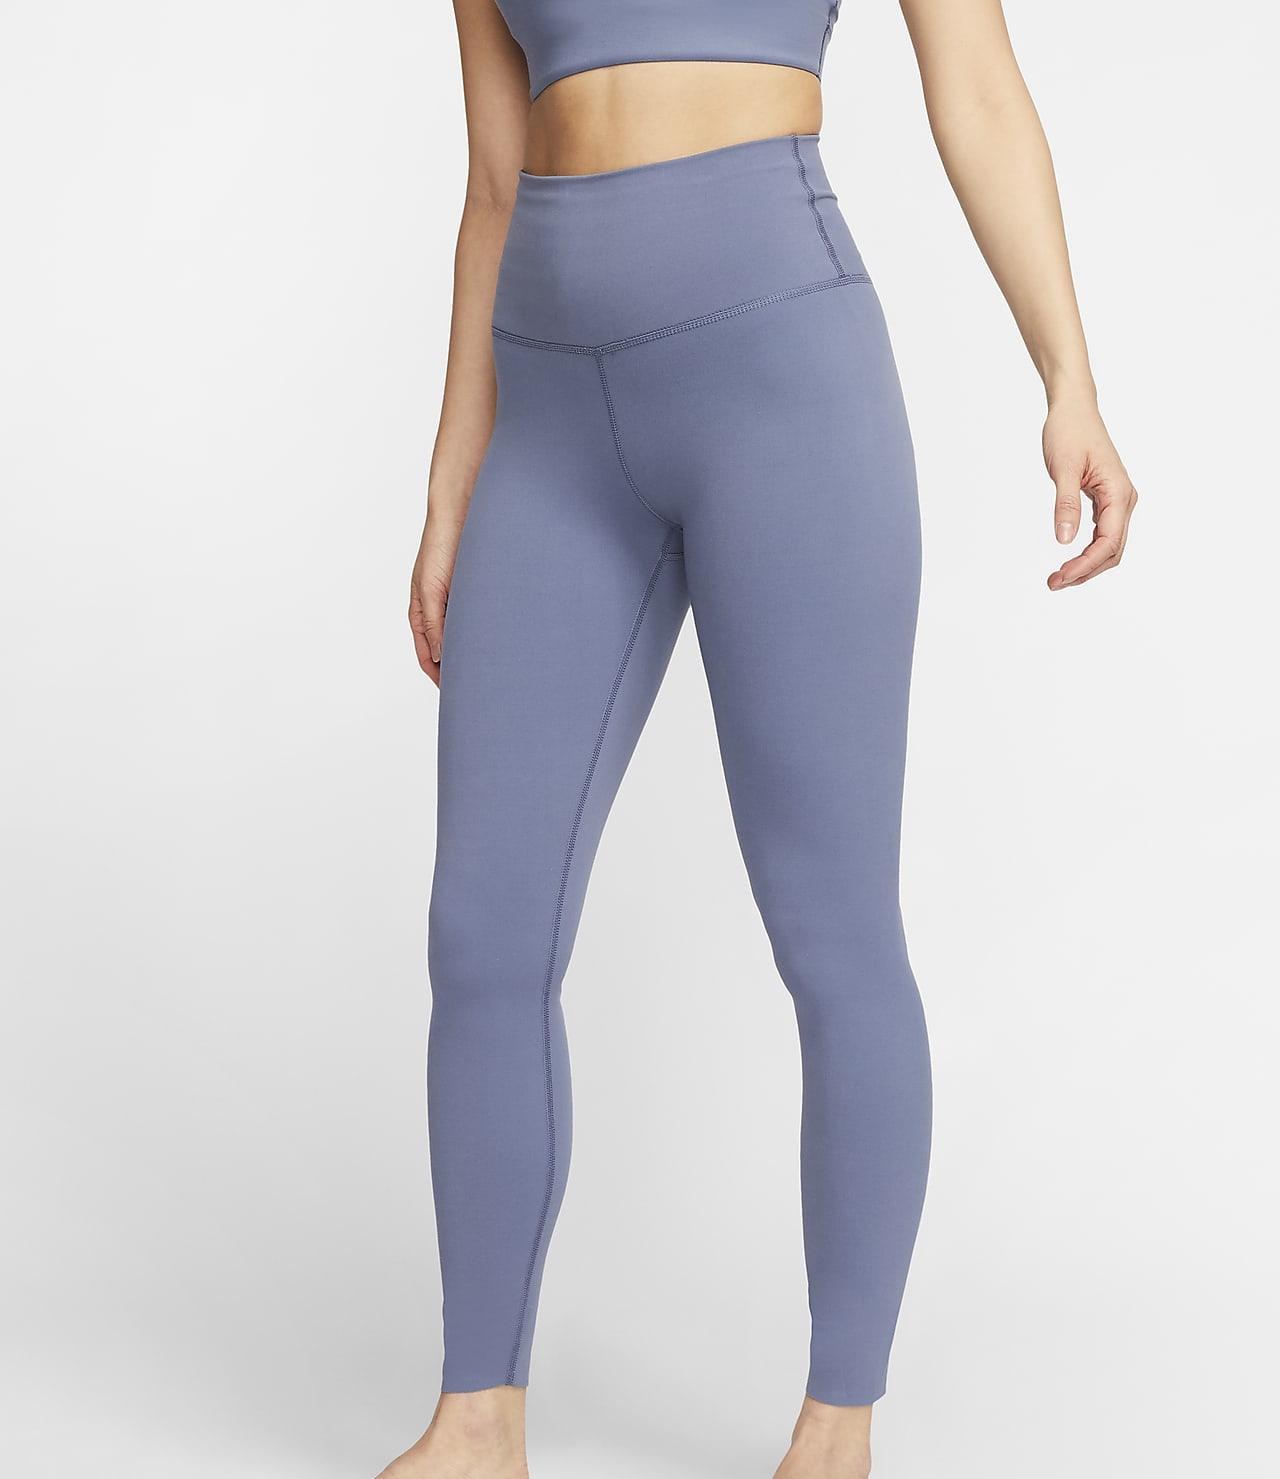 Nike Yoga Luxe Leggings Blue